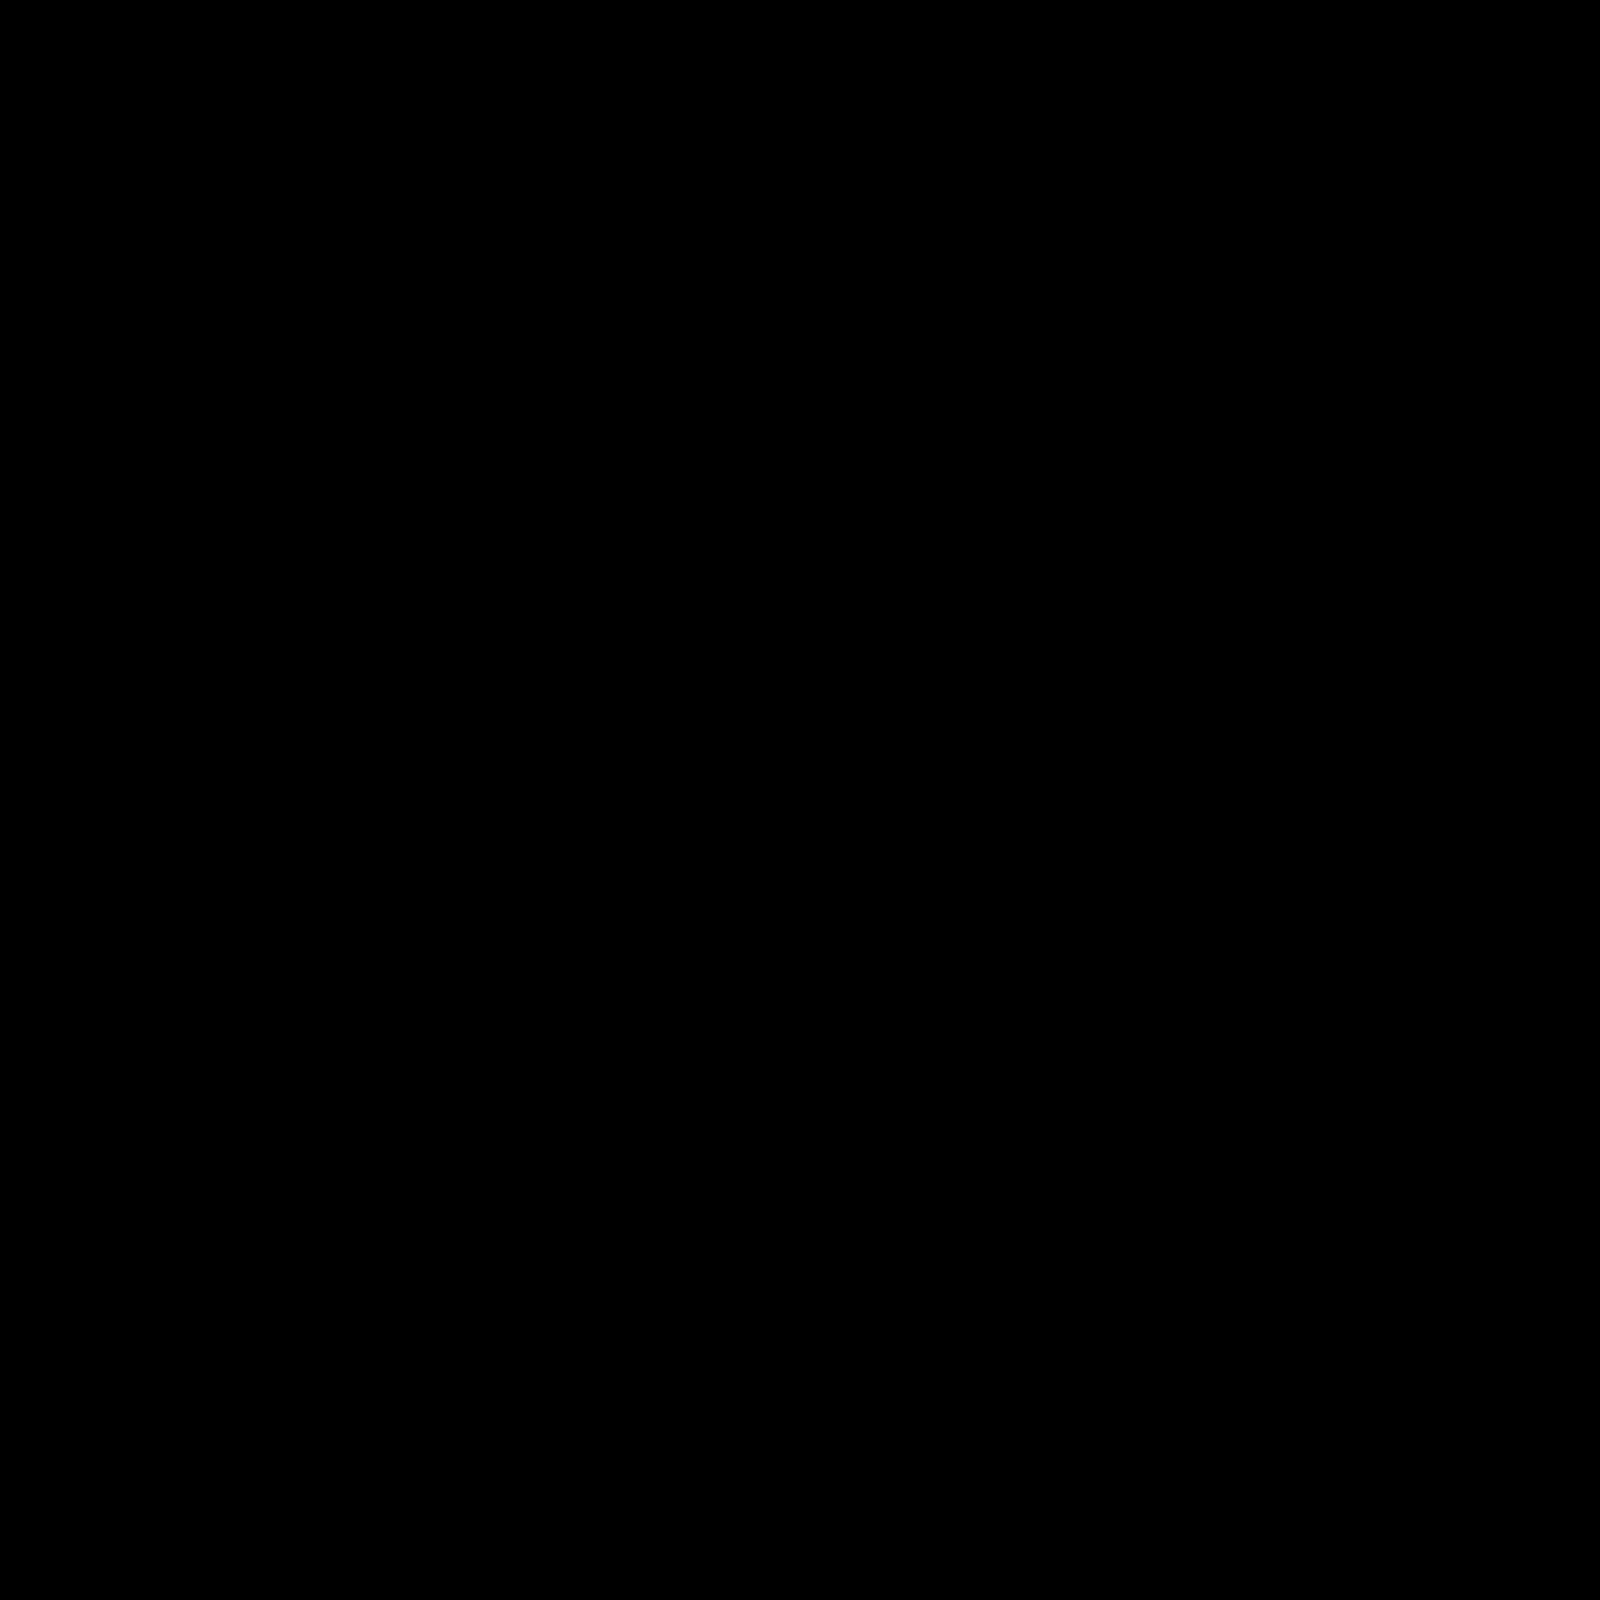 Basketball Player icon